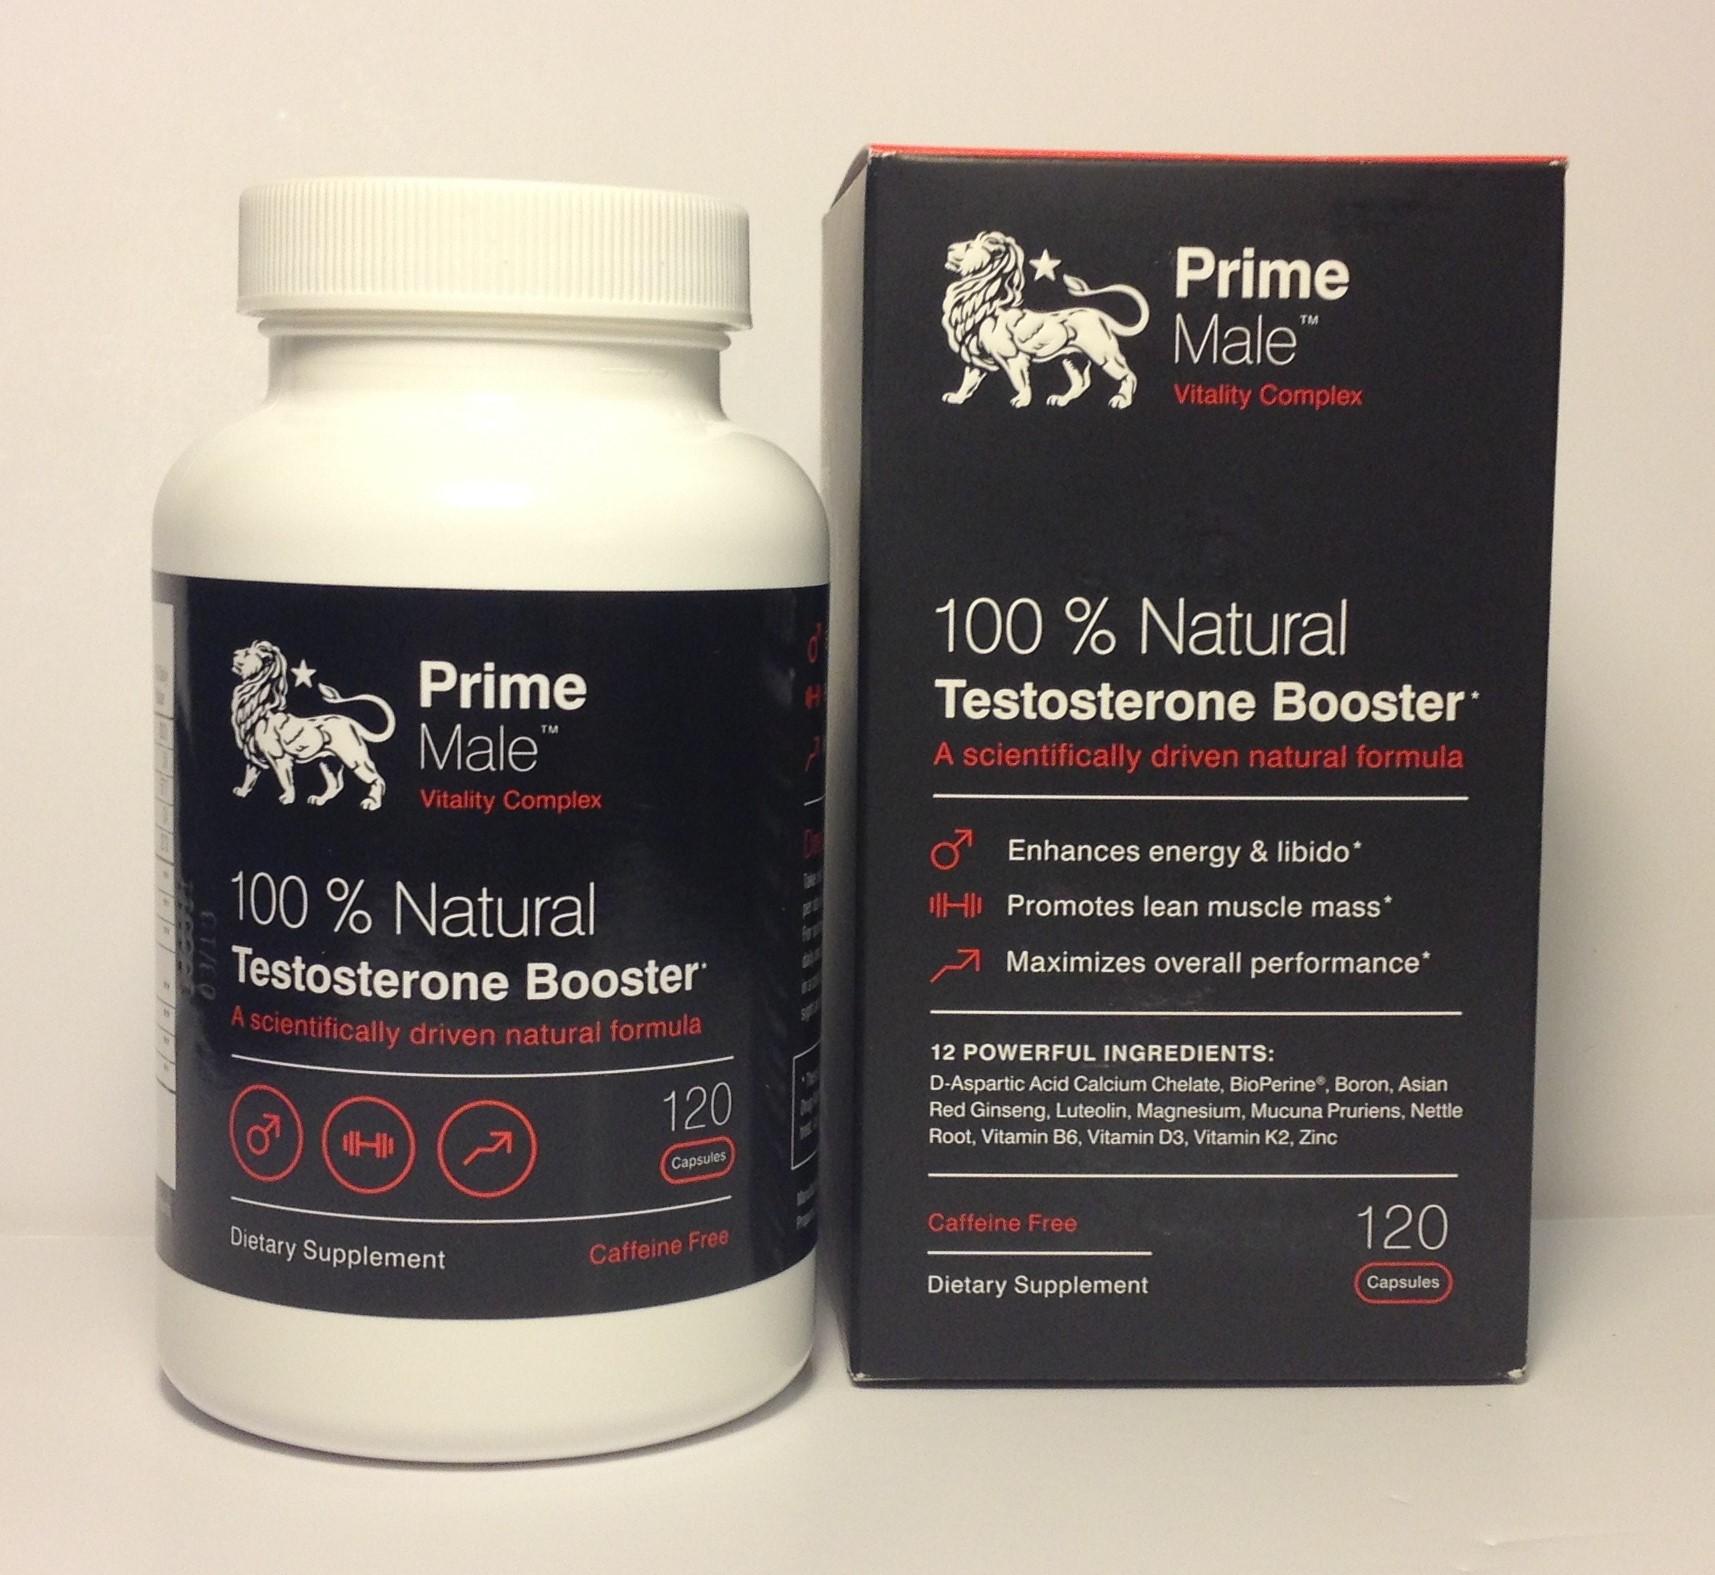 Best Testosterone Boosters Australia & New Zealand 2016 – Supplement Reviews Australasia